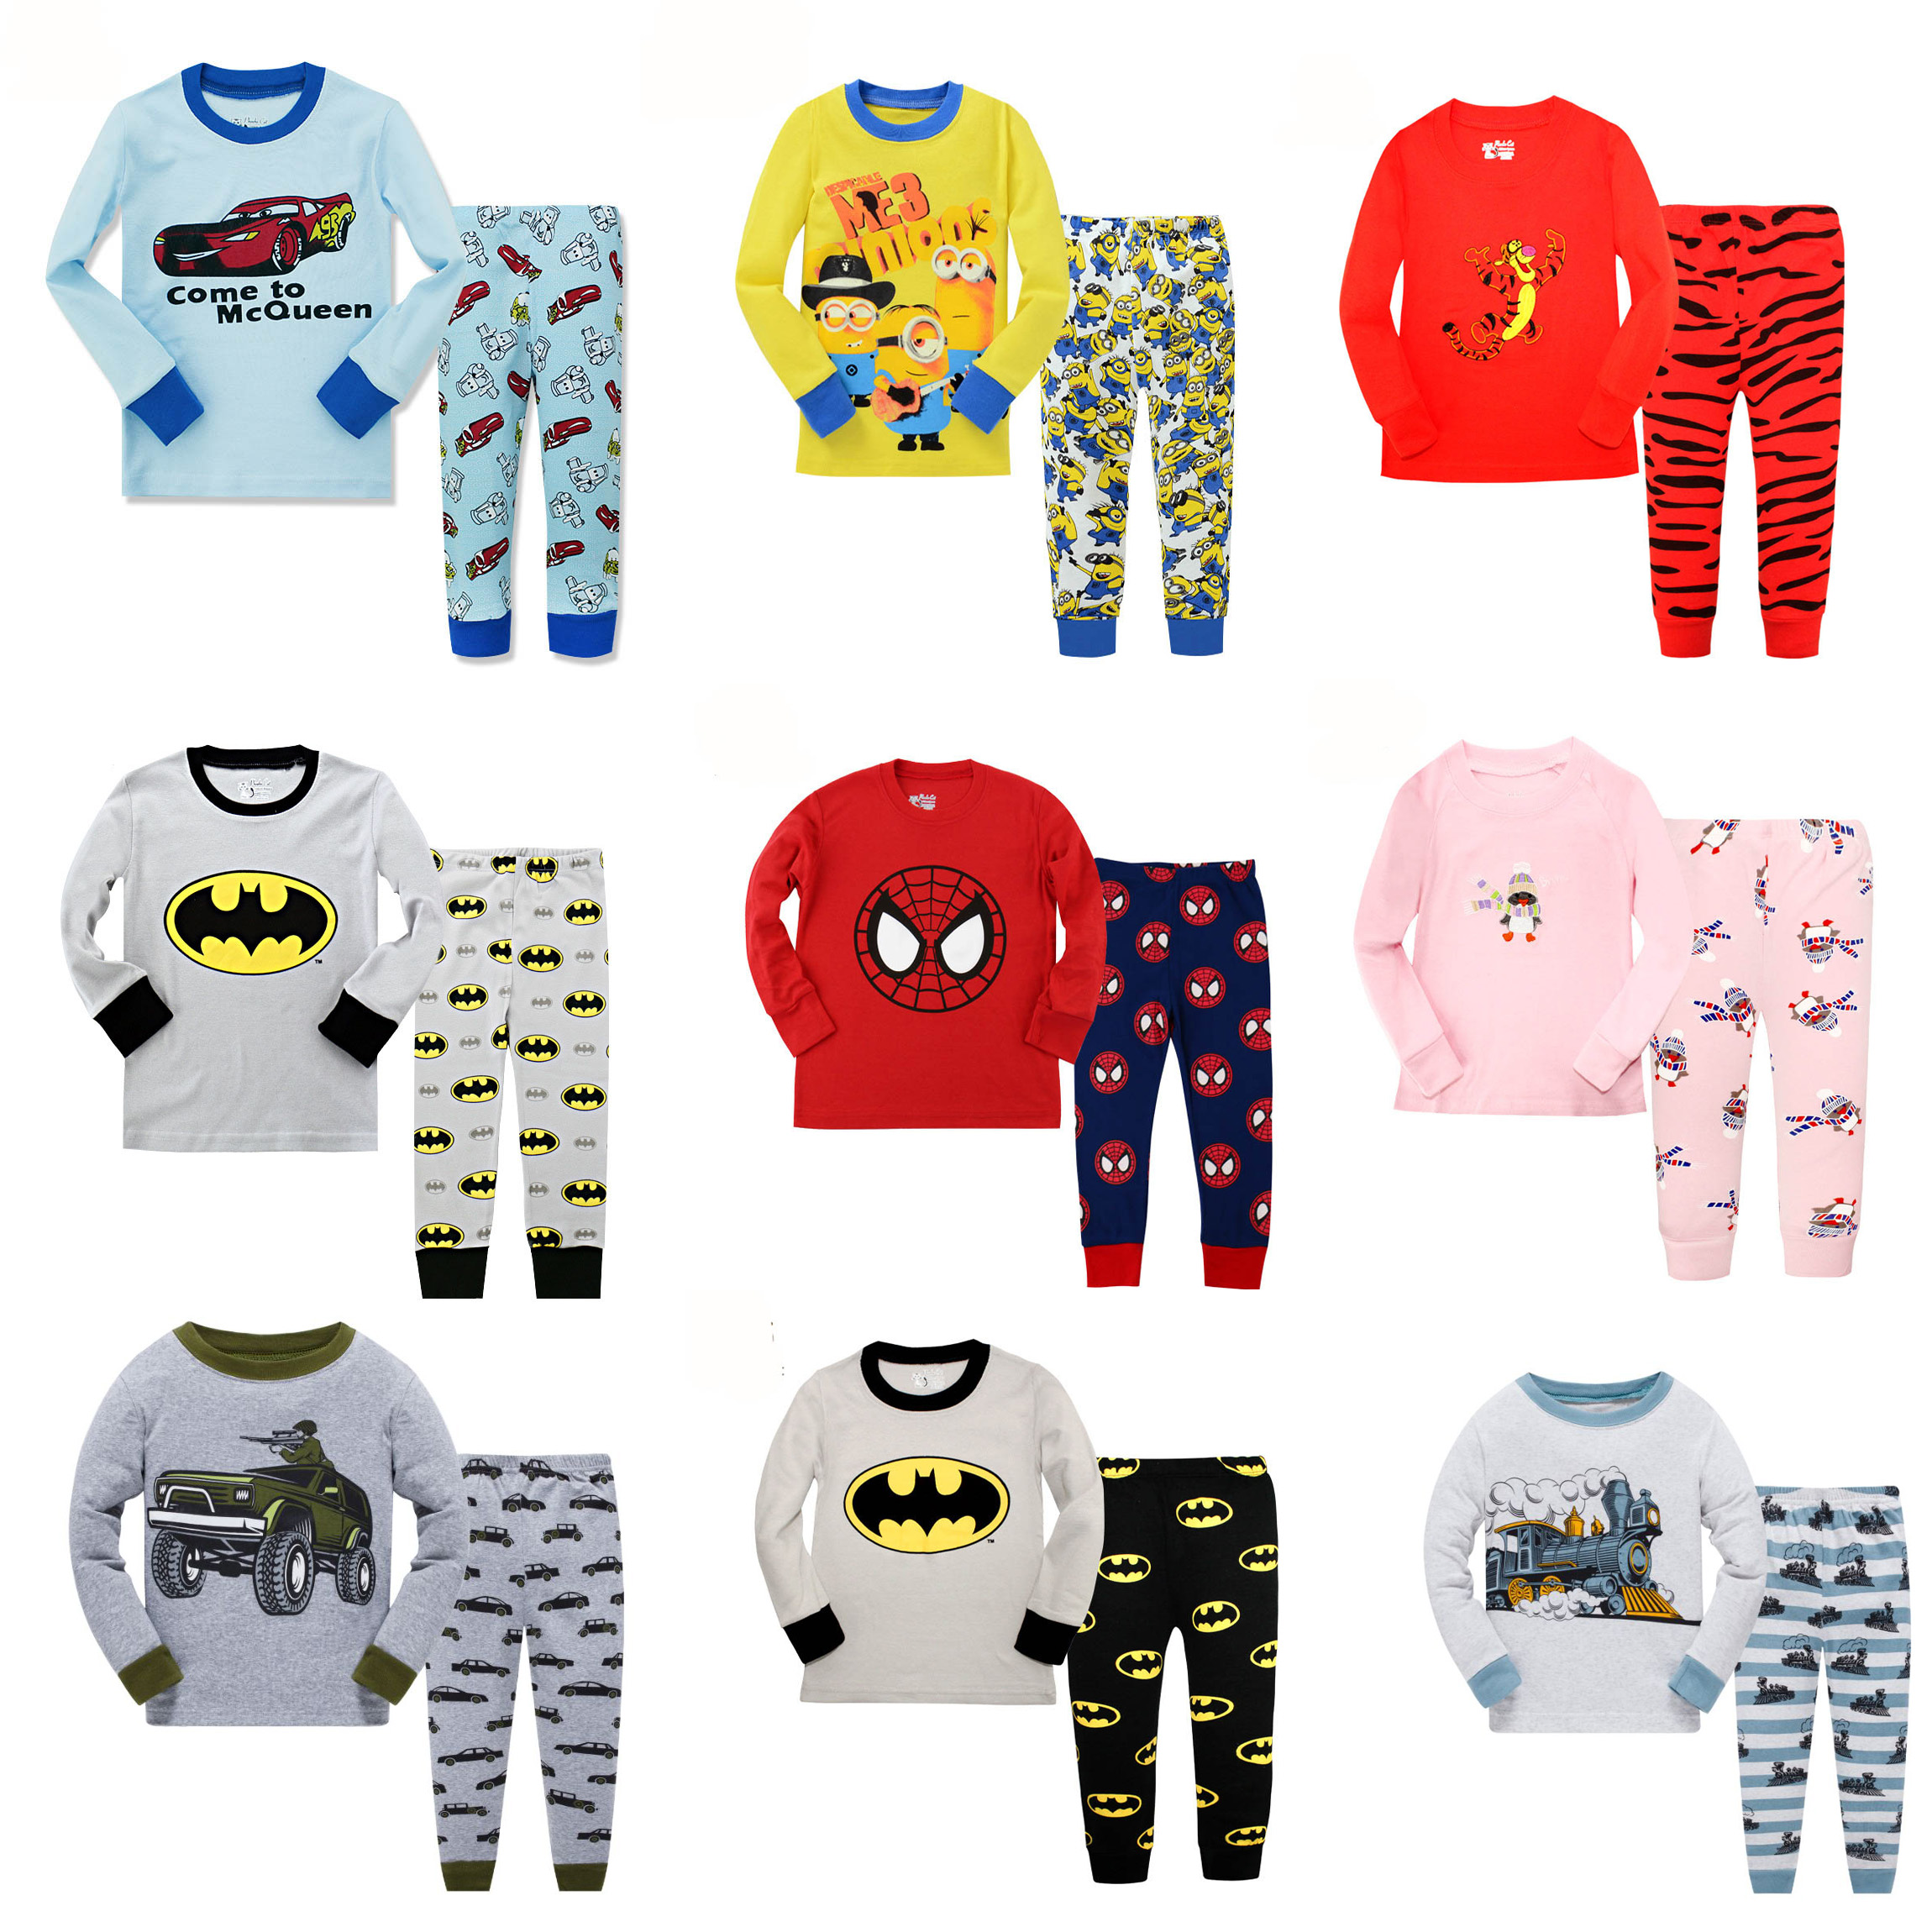 Floret LULU Kid's Pajamas Sets Boys Spiderman Cotton Car Styling Baby Kids Pijama Infantil Pyjama Girl Home Clothes Christmas